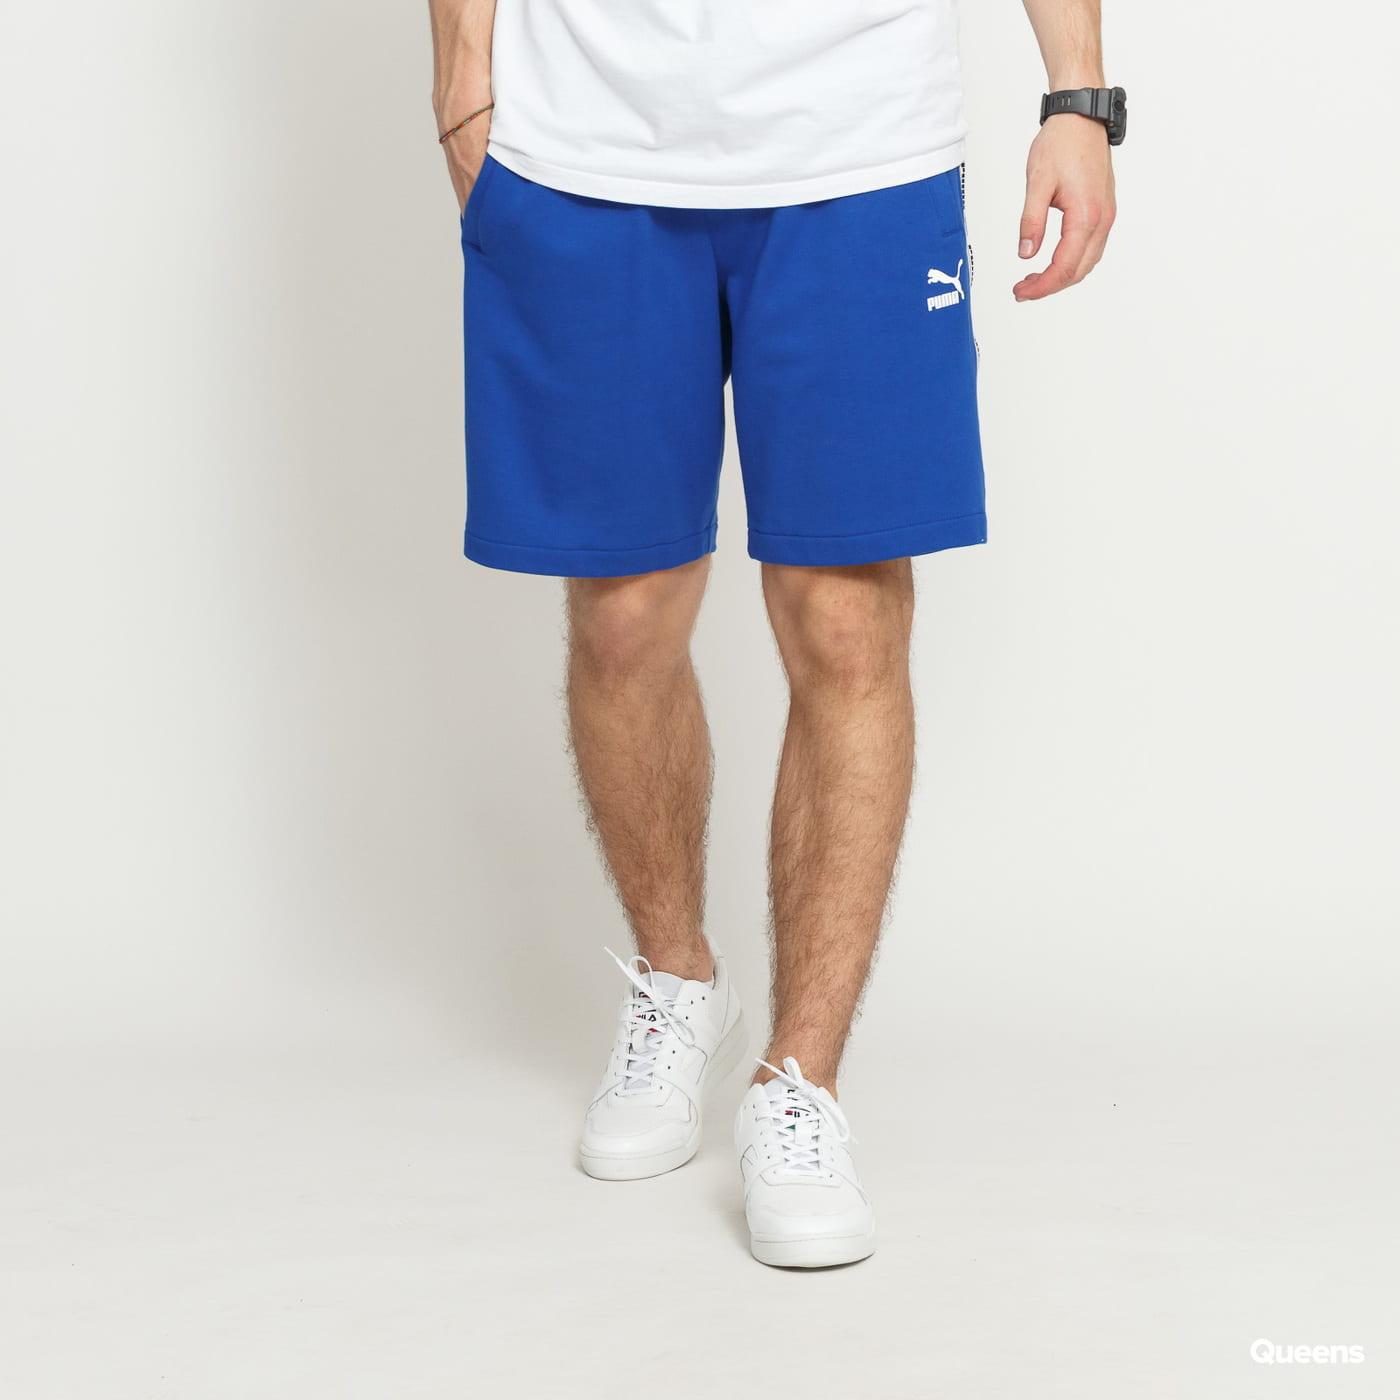 ce3b79f3539 Sweat Shorts Puma Puma XTG Shorts 8' blue (577994 29) – Queens 💚